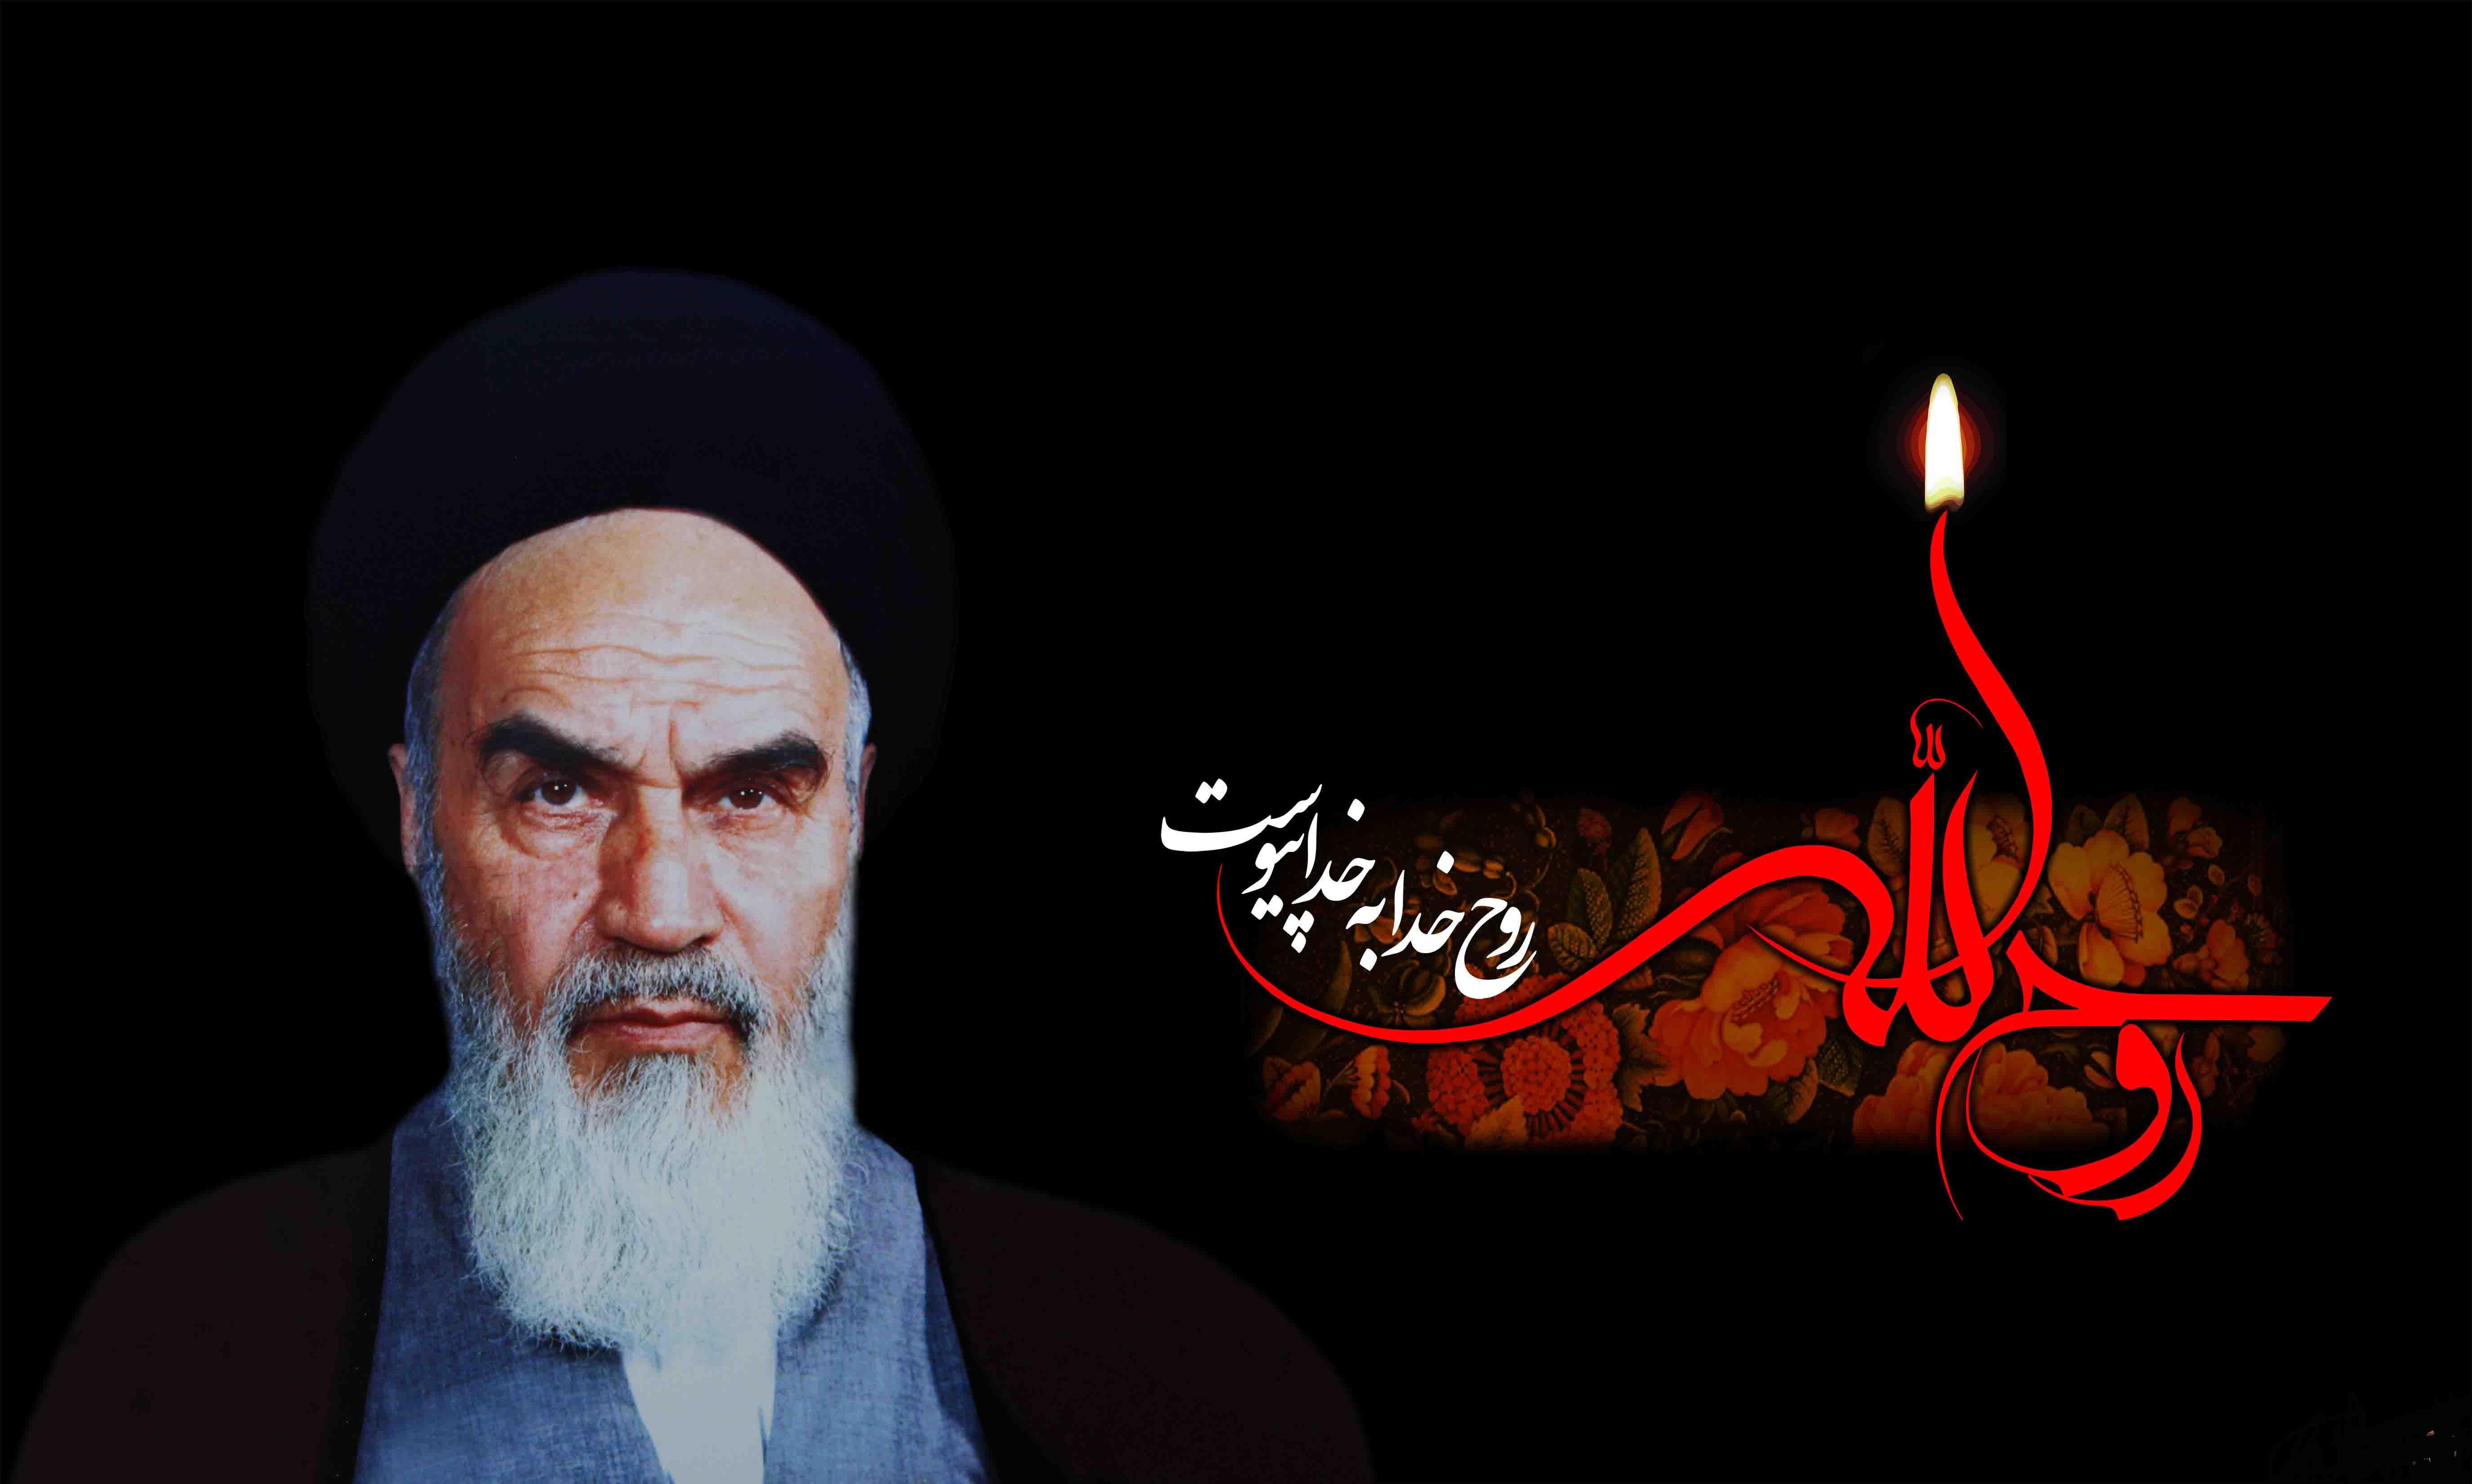 رحلت حضرت امام خمینی (ره) تسلیت باد